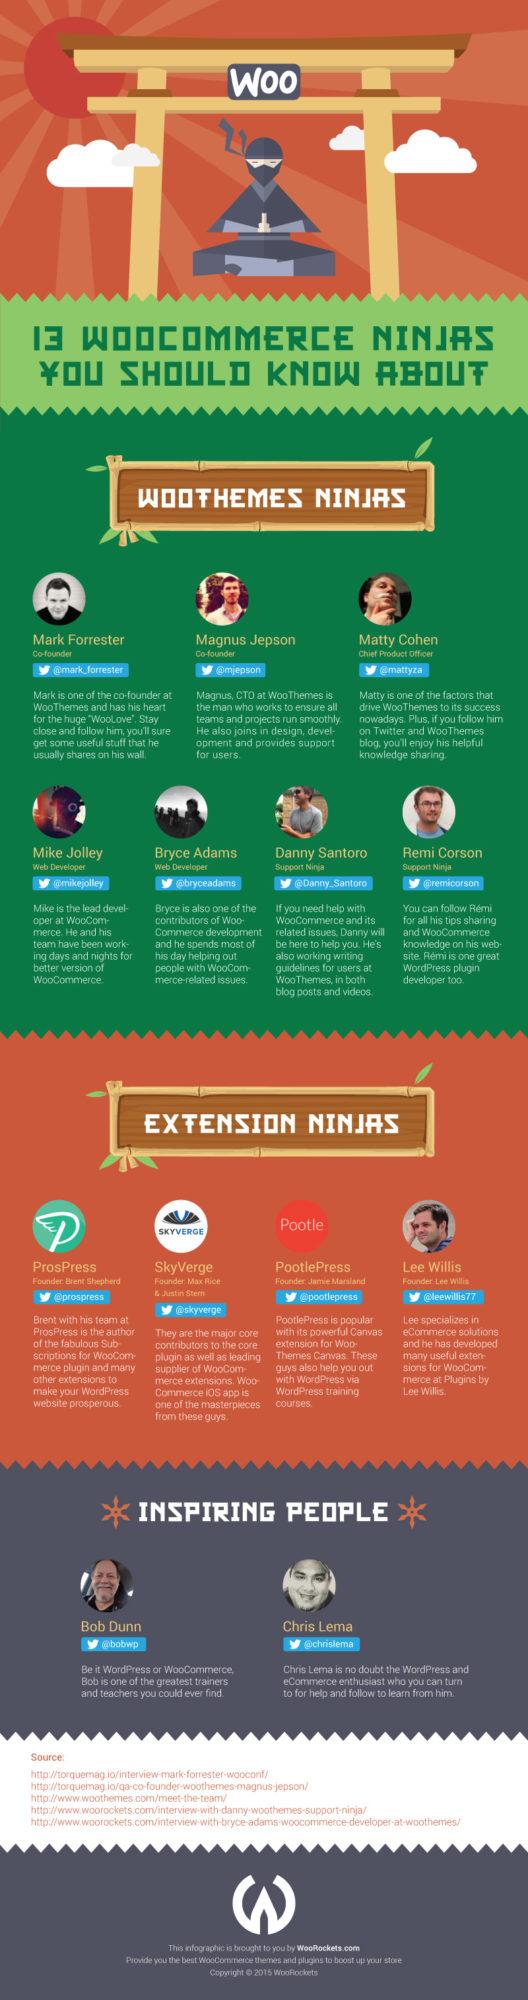 infographic_top-woocommerce-ninja-to-follow